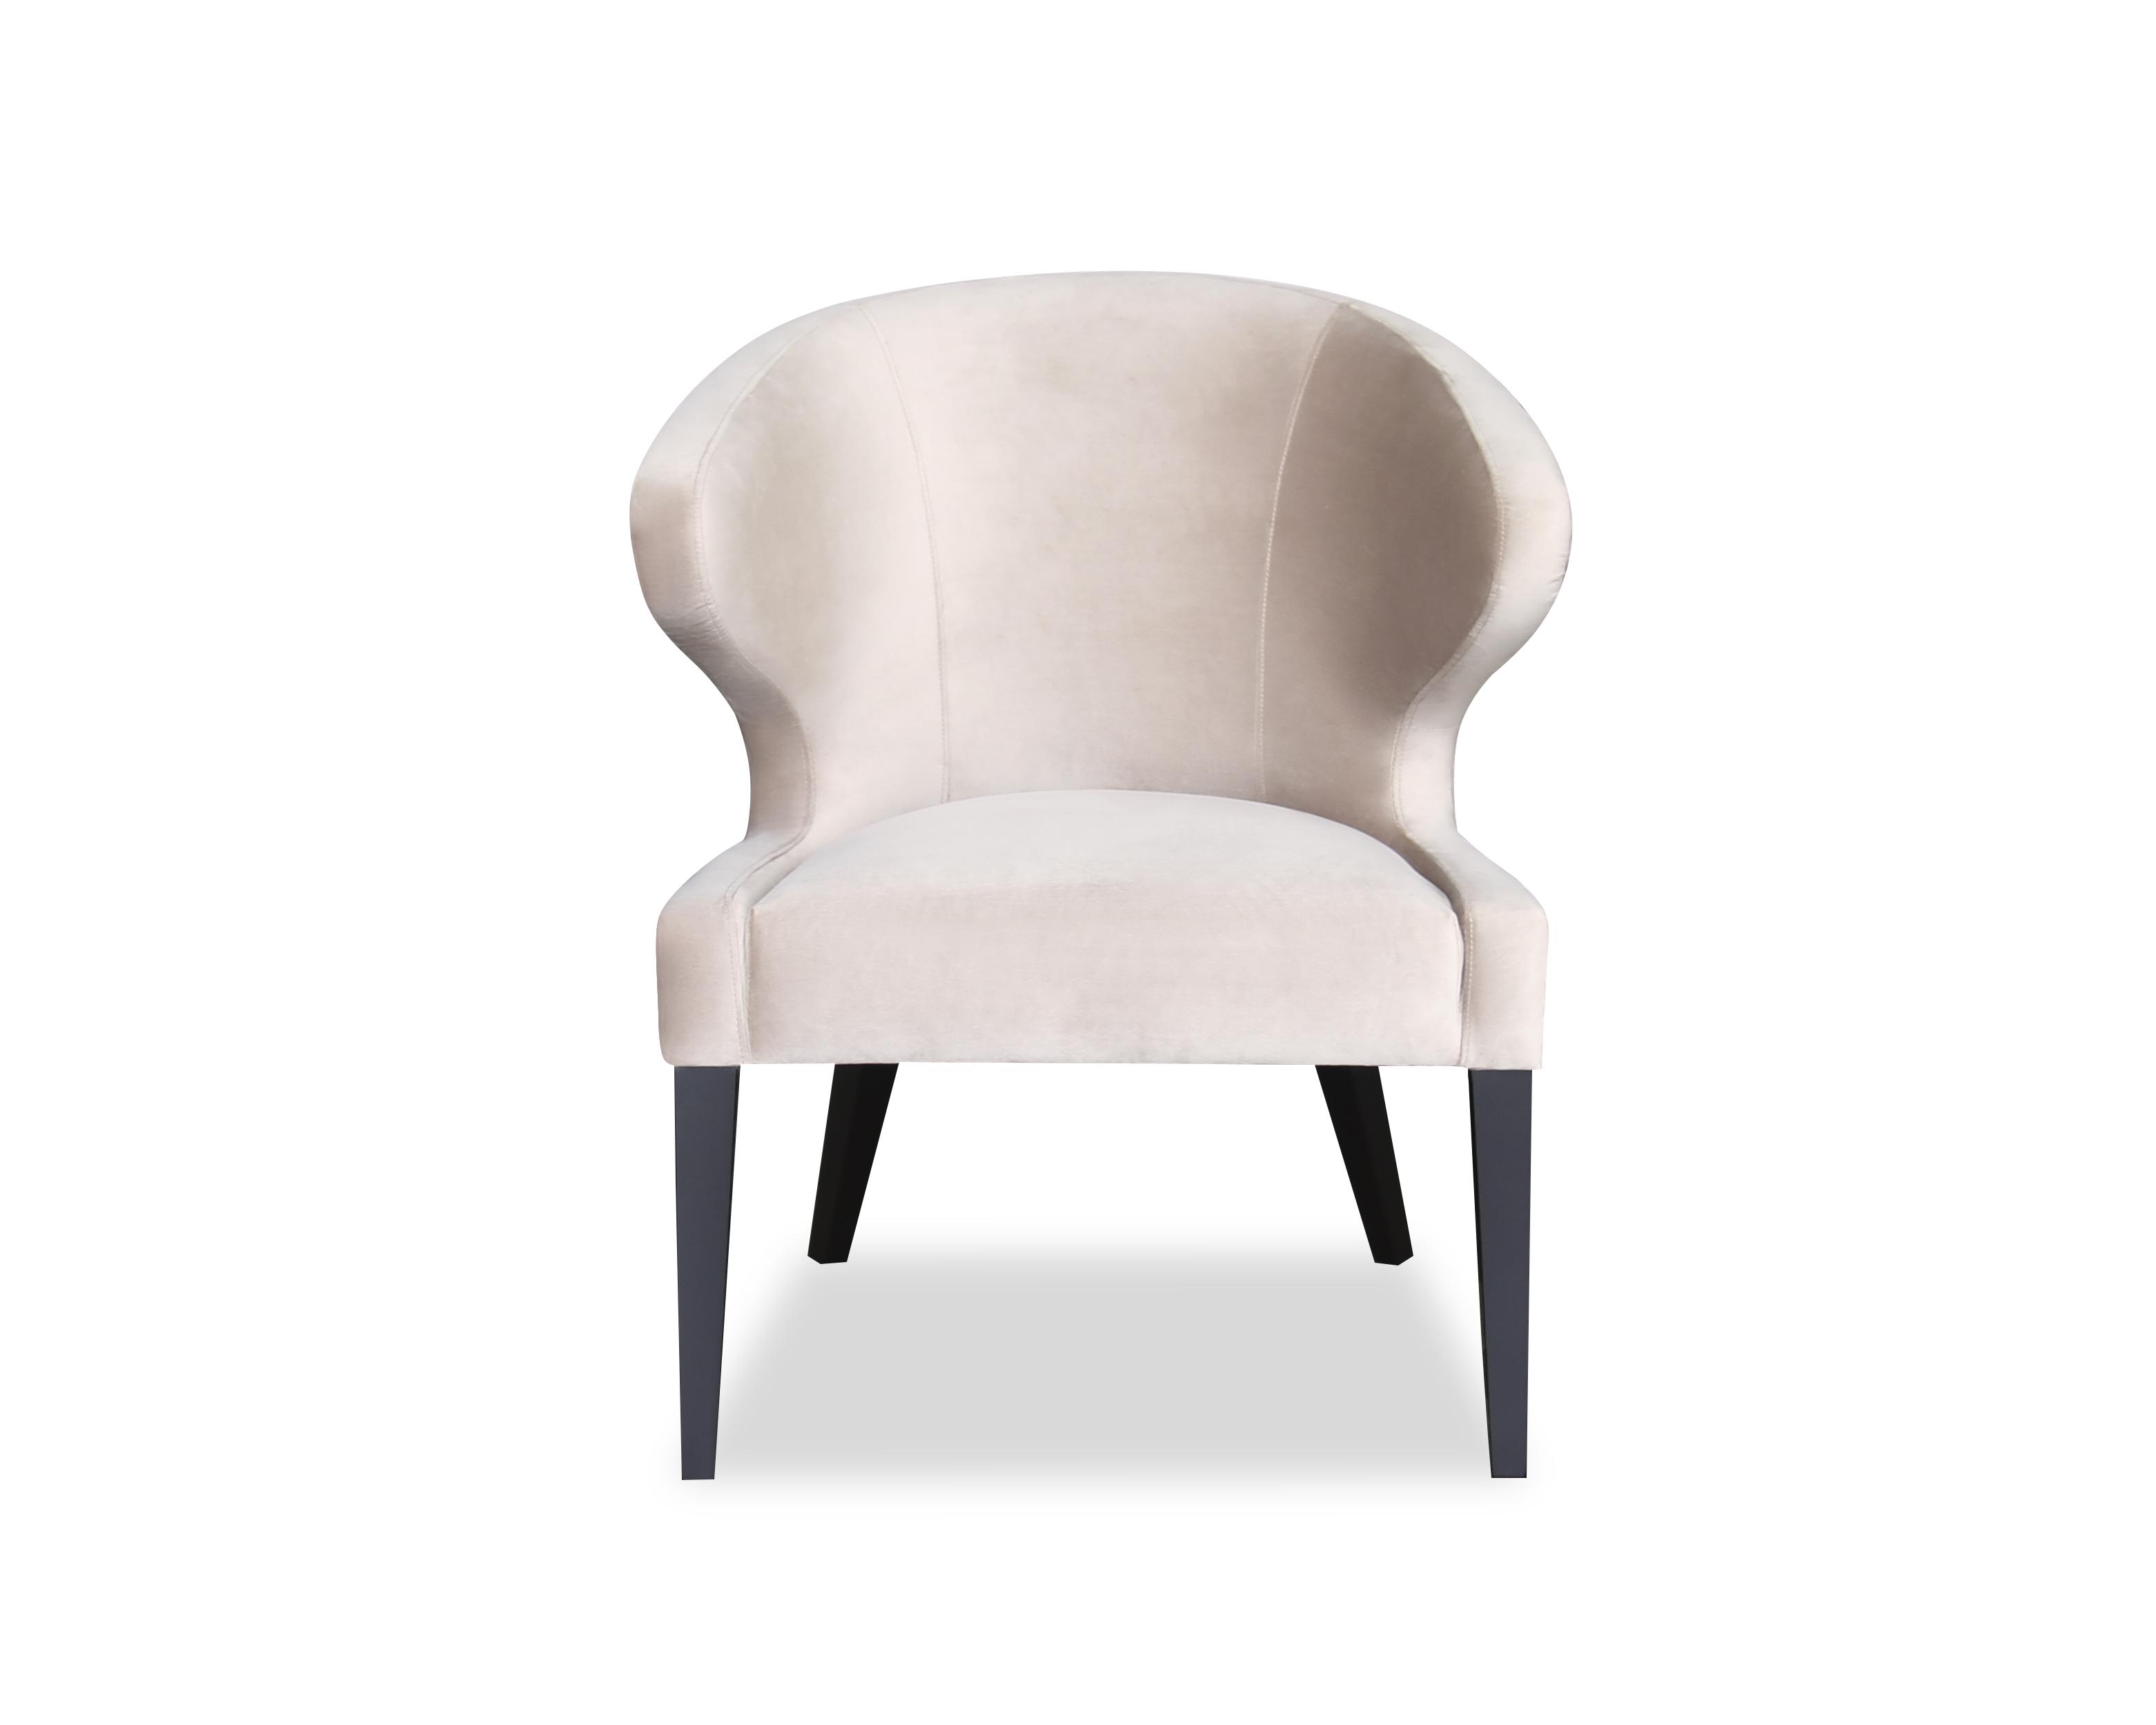 Liang & Eimil Taylor Occasional Chair Ives Mink Velvet OD-OCH-007 (2)